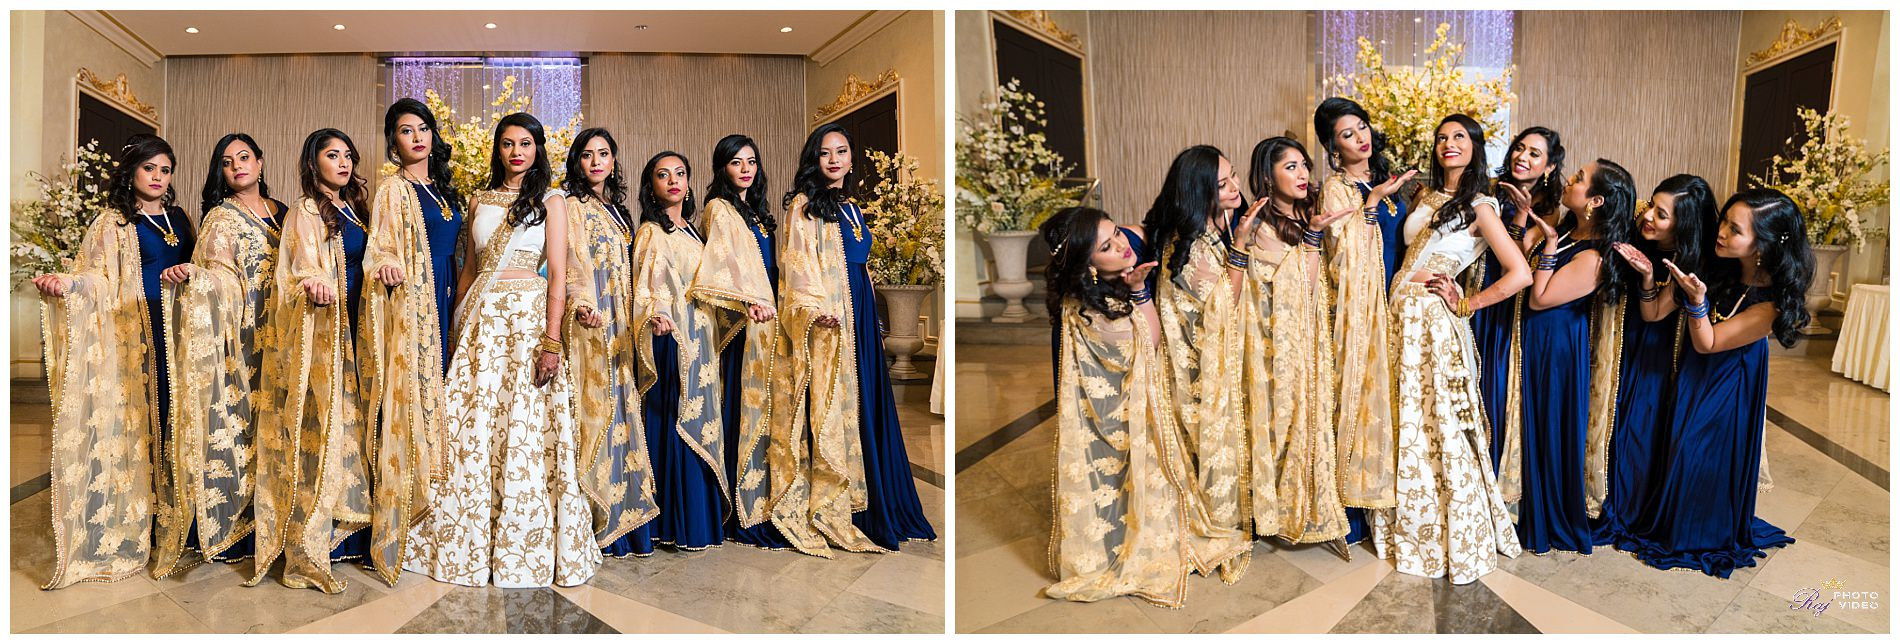 Royal-Manor-Garfield-NJ-Christian-Wedding-Ceremony-Khusbu-Jeff-27.jpg